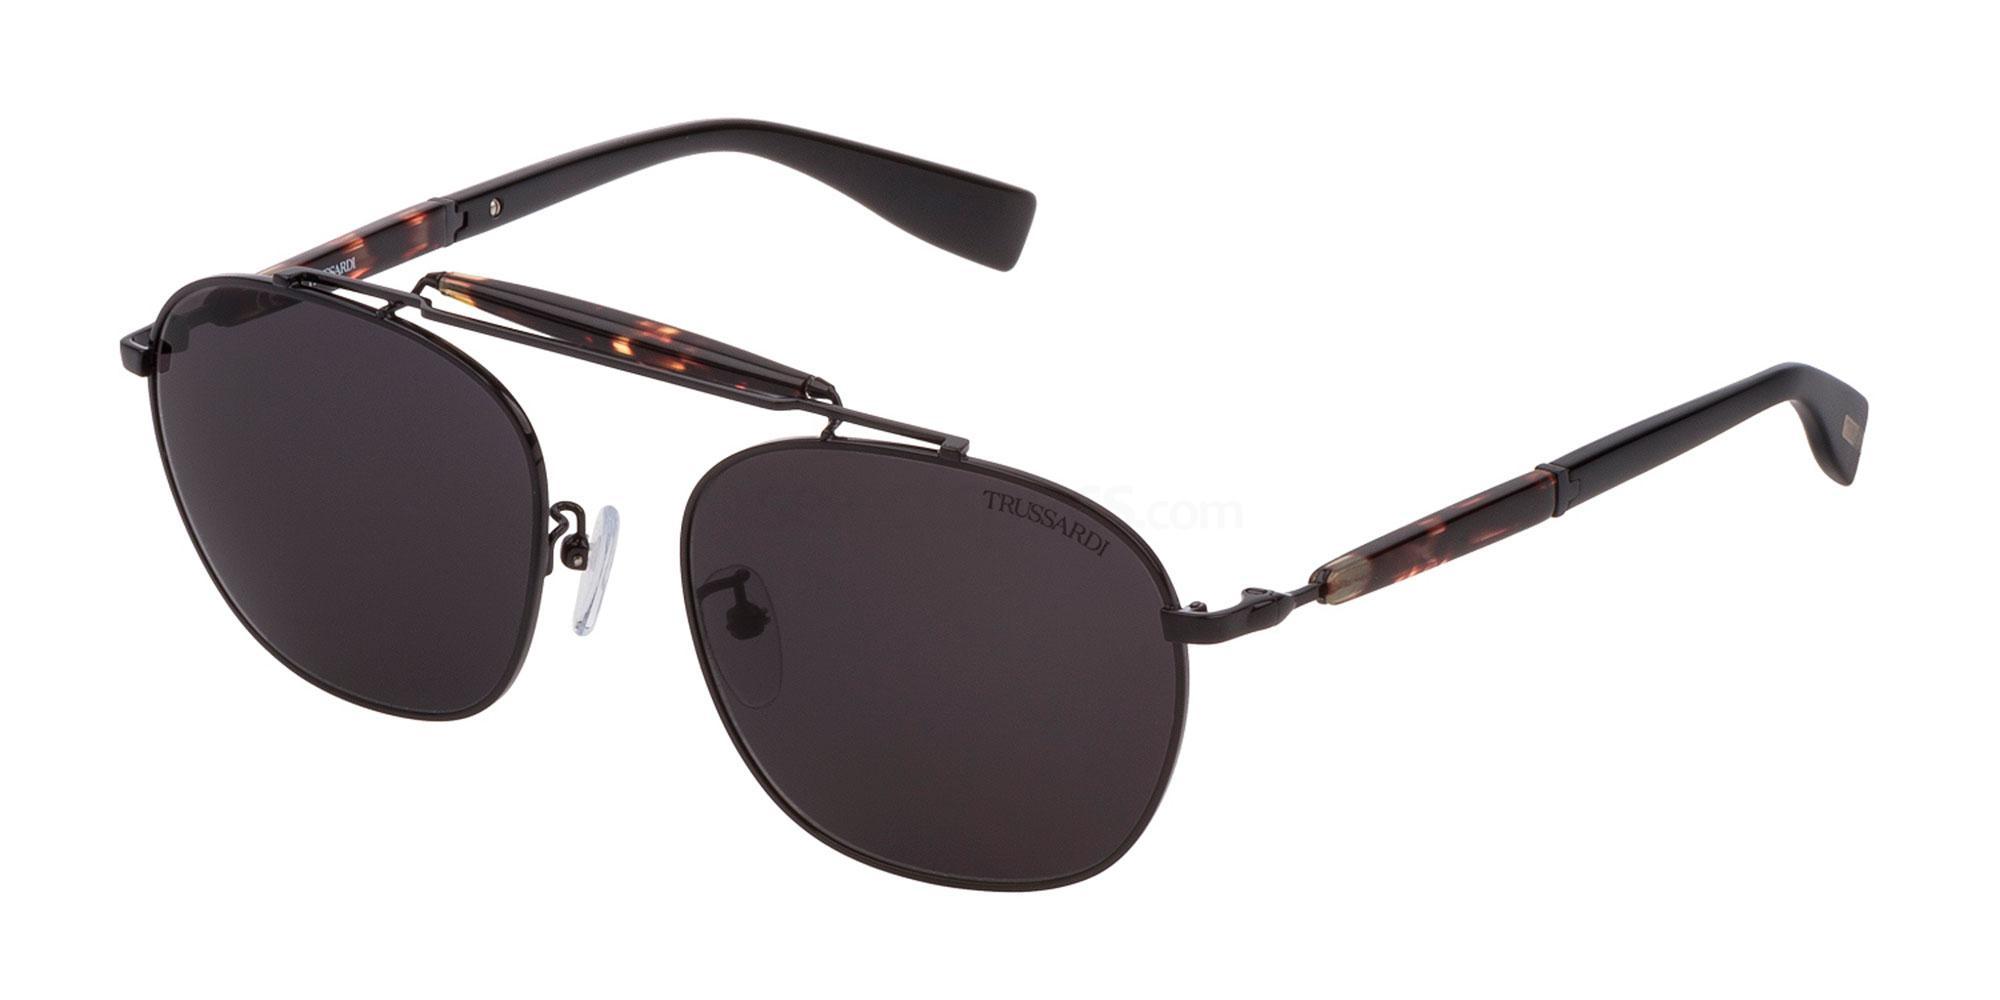 0530 STR360 Sunglasses, Trussardi